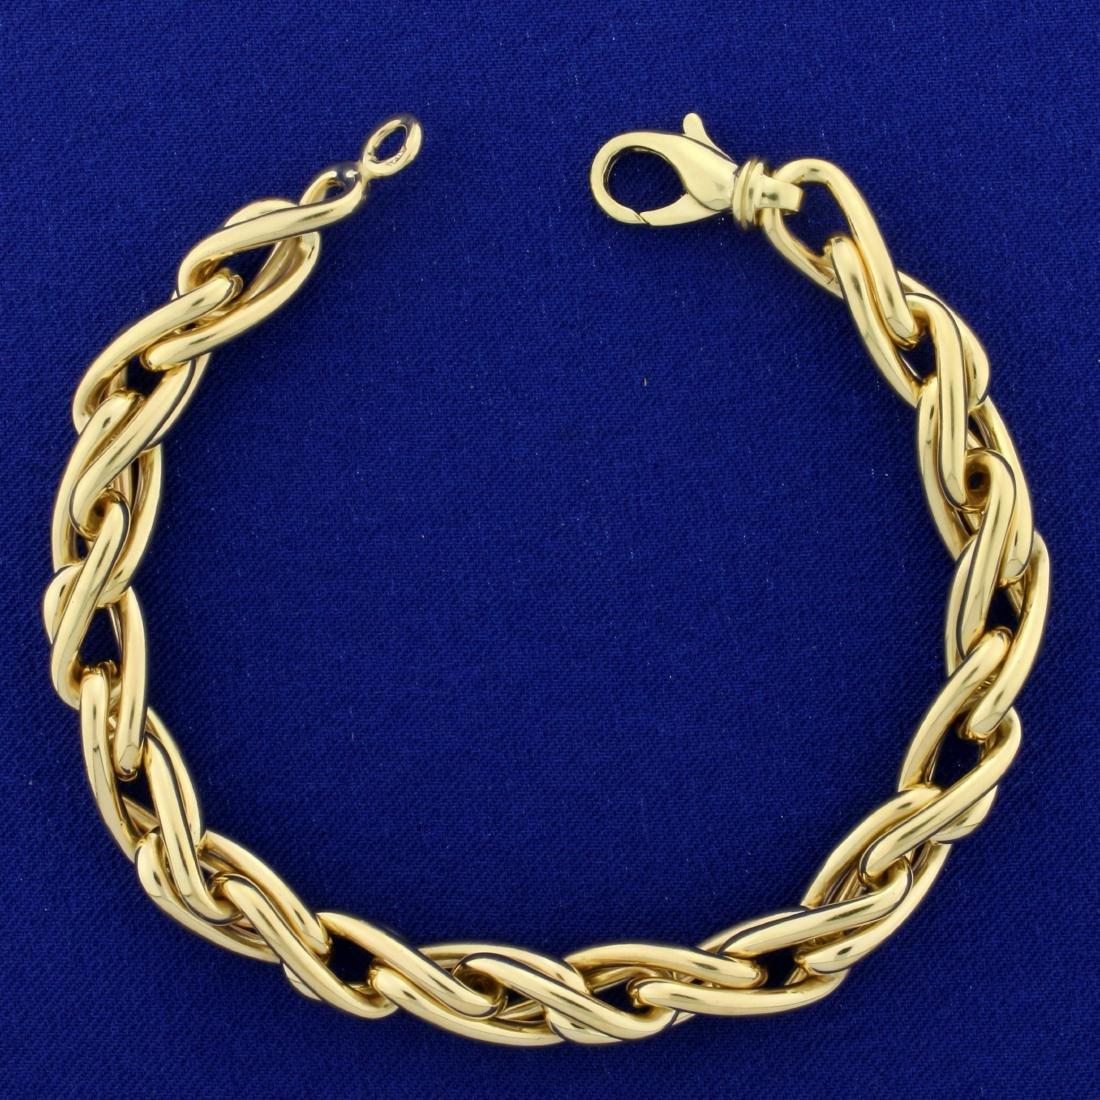 Heavy Italian Made Designer Twisting Link Bracelet in